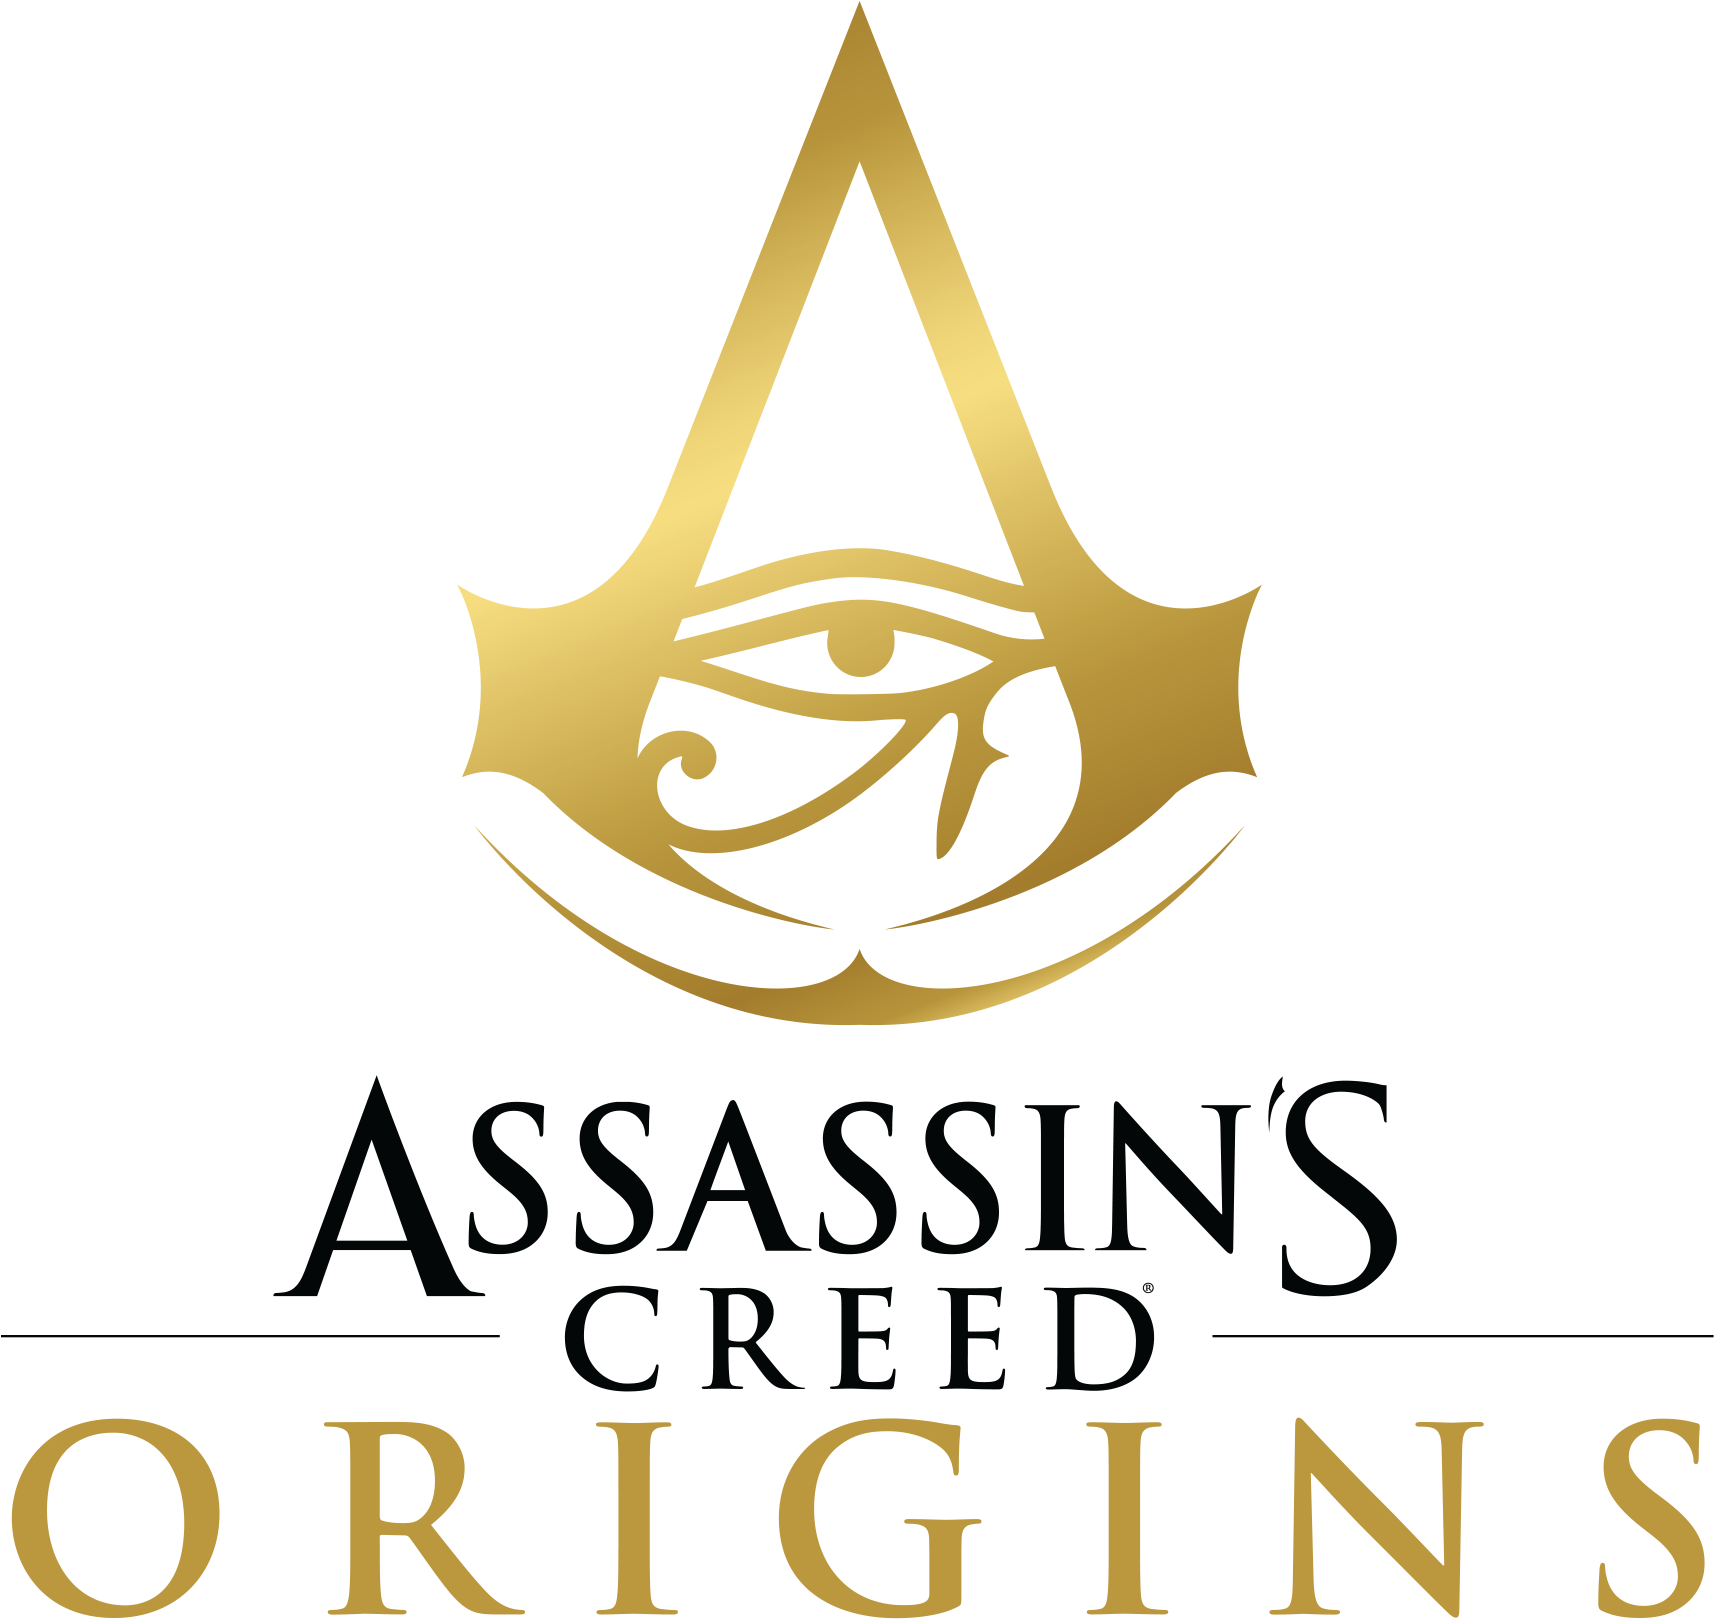 Assassin S Creed Black Flag Logo Png Assassin S Creed Origins